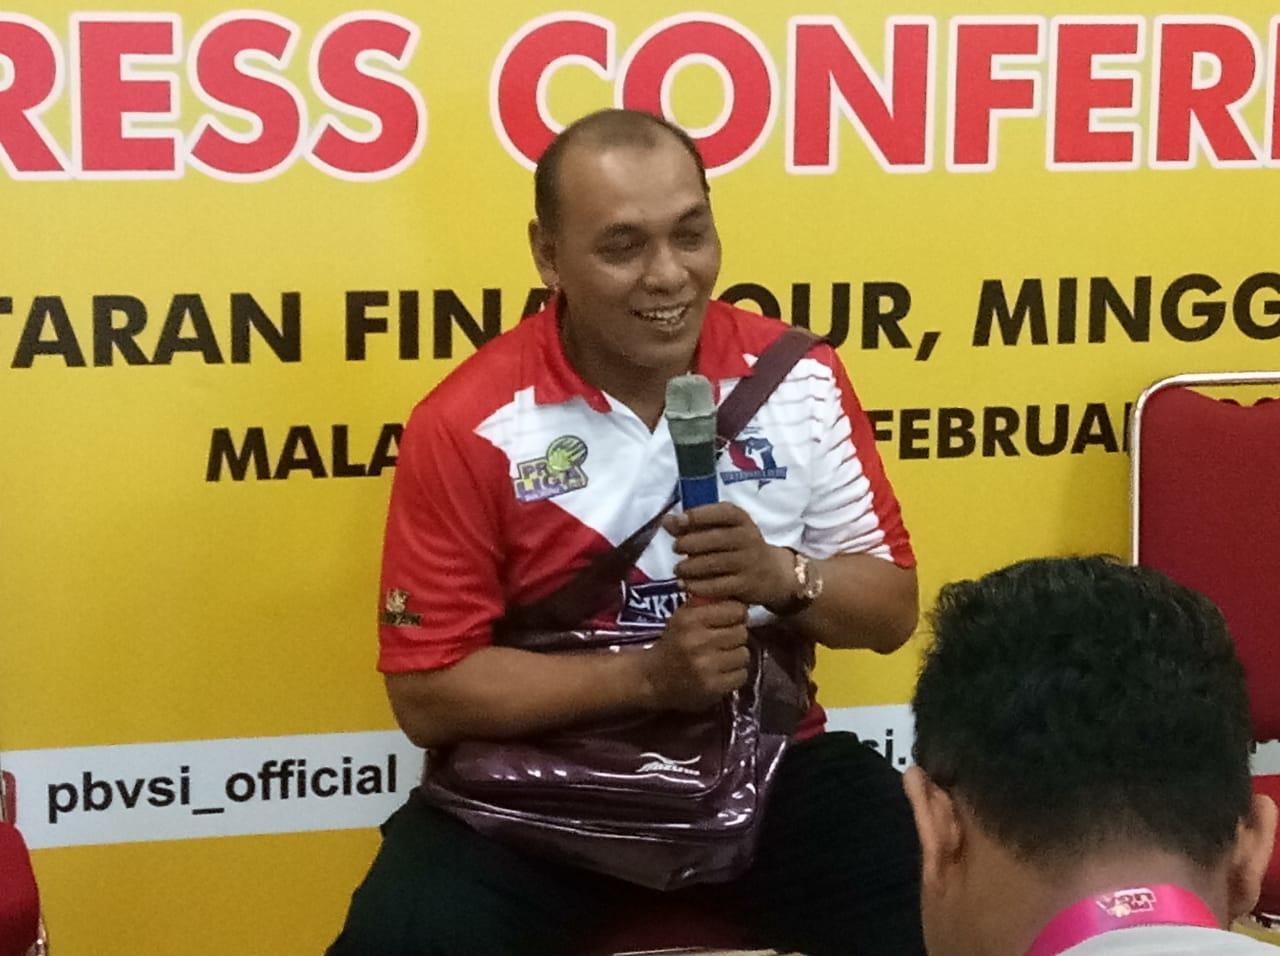 Pelatih Surabaya Bhayangkara  Samator Ibarsjah Djanu Tjahjono usai timnya menghadapi BNI 46 di GOR Ken Arok, Jumat (15/2/2019).